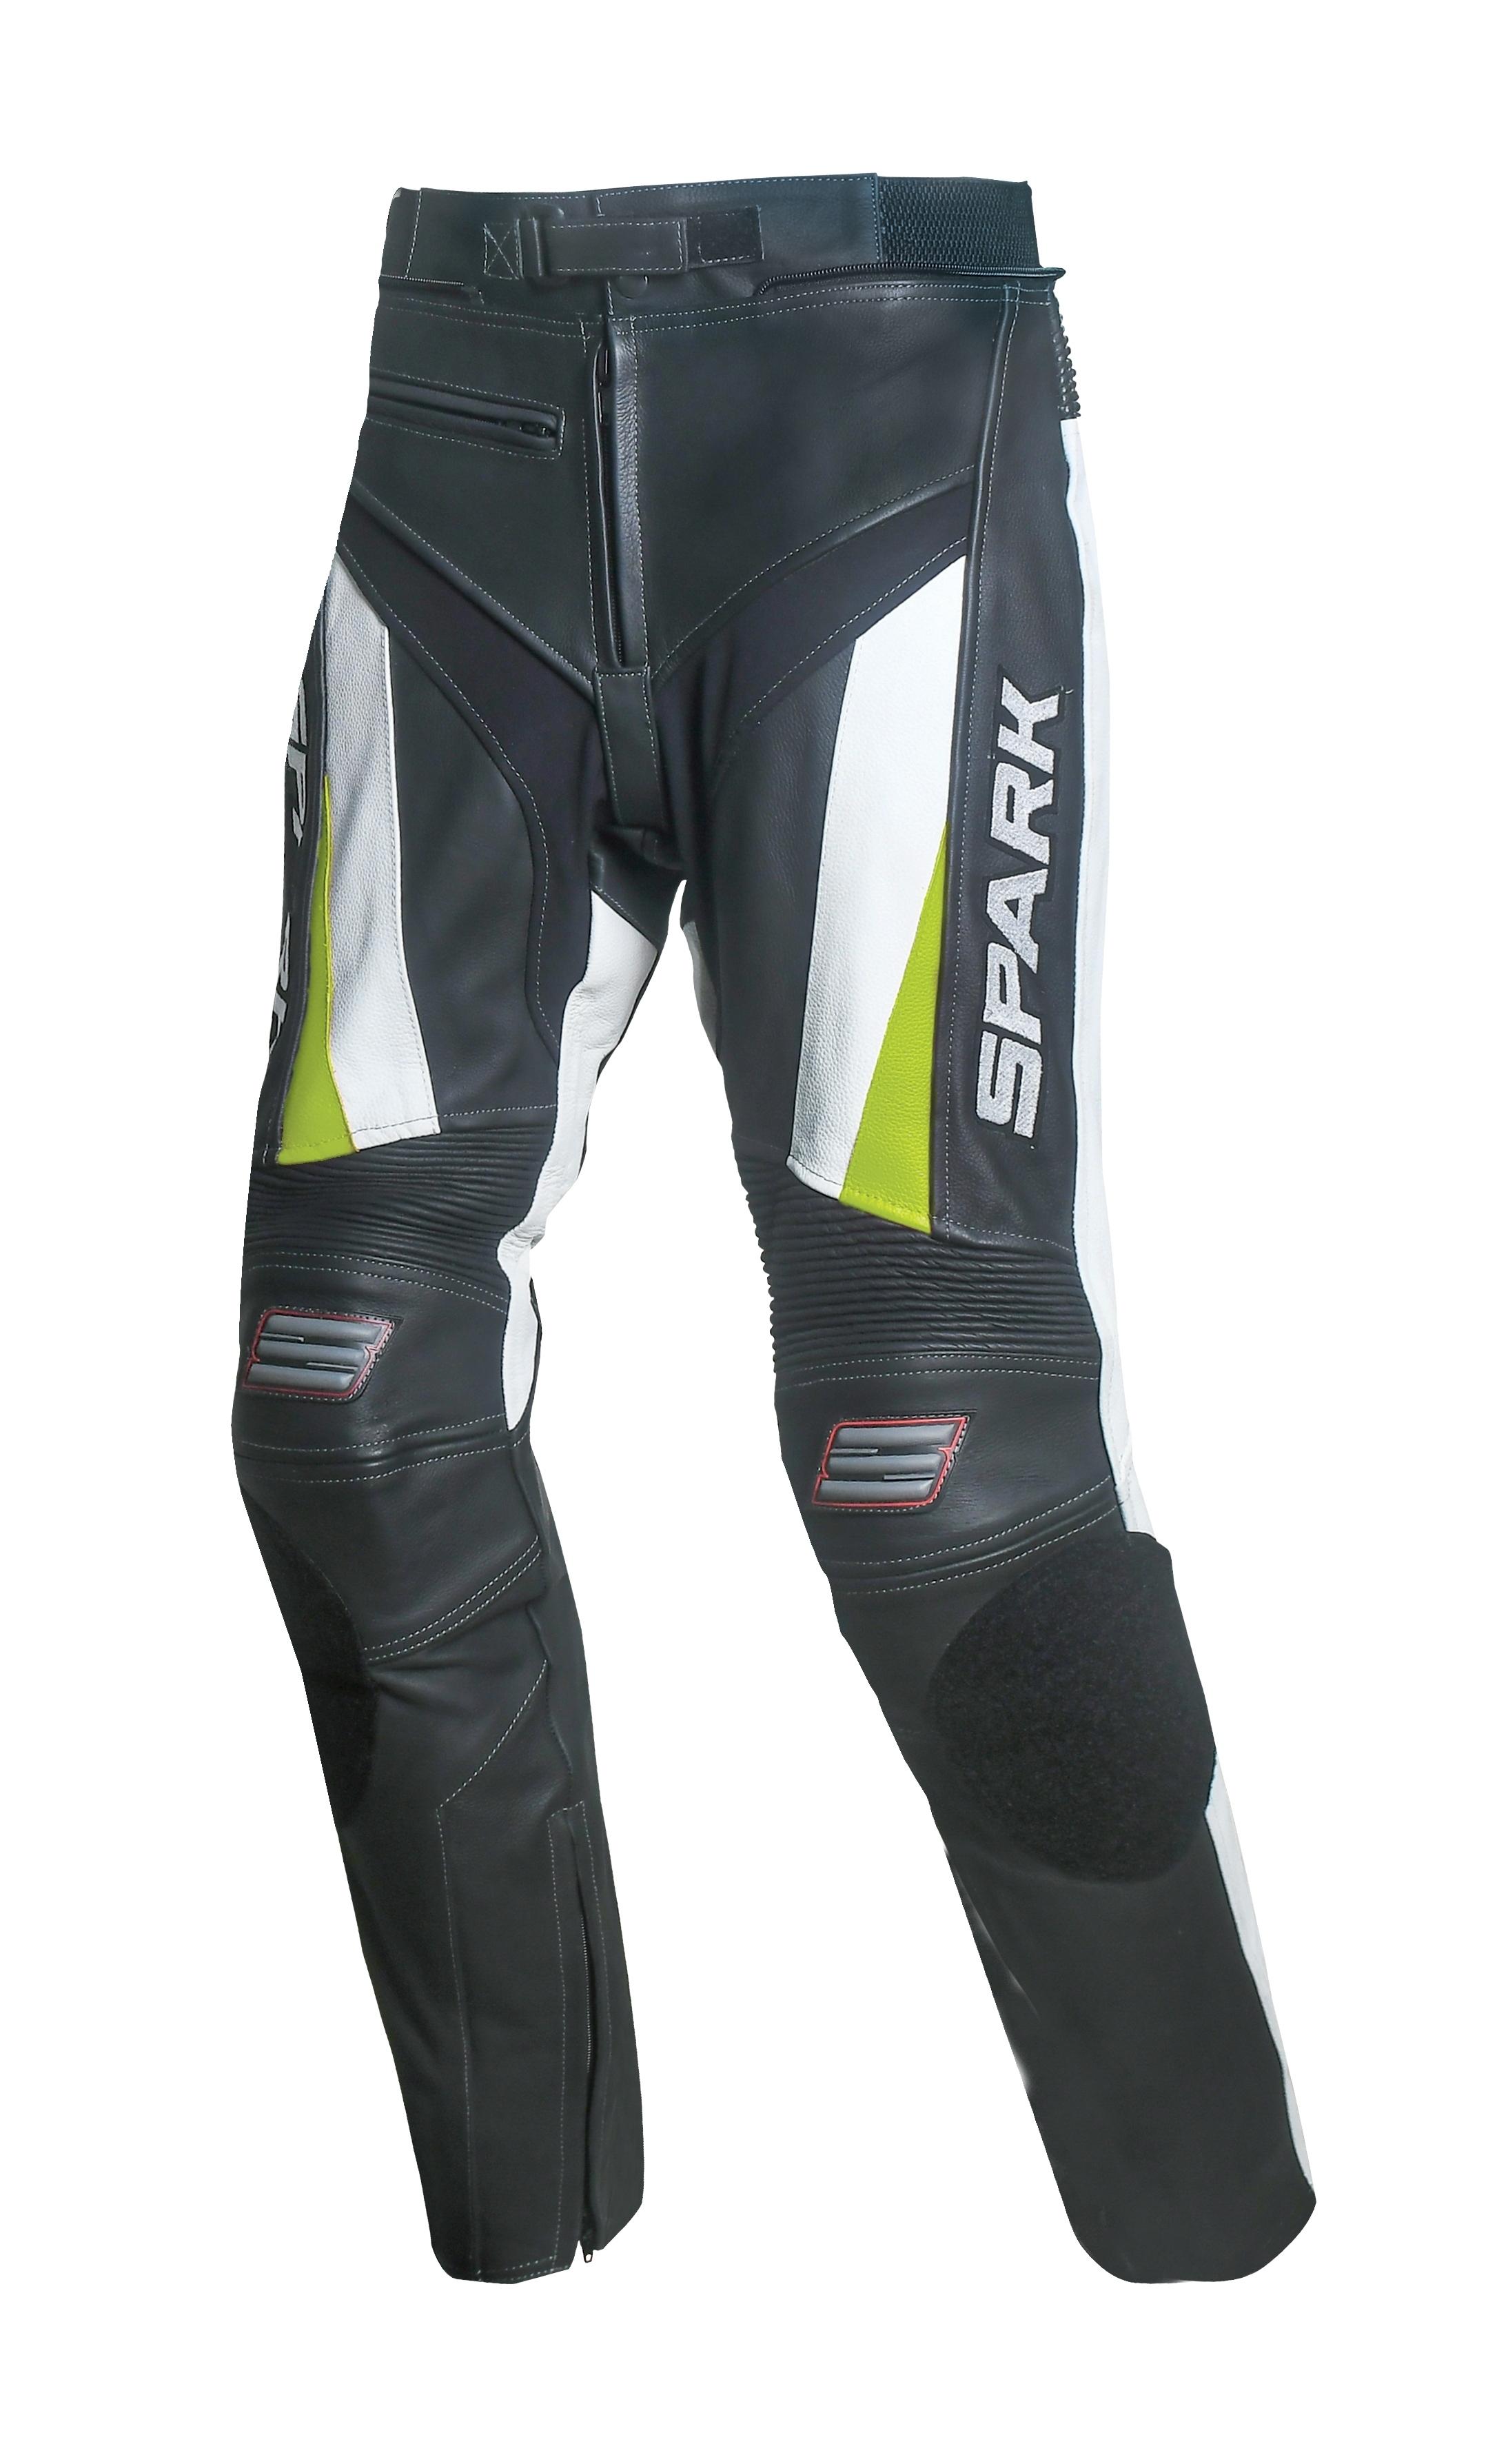 Pánské kožené moto kalhoty Spark ProComp Evo, bílé - poškozené